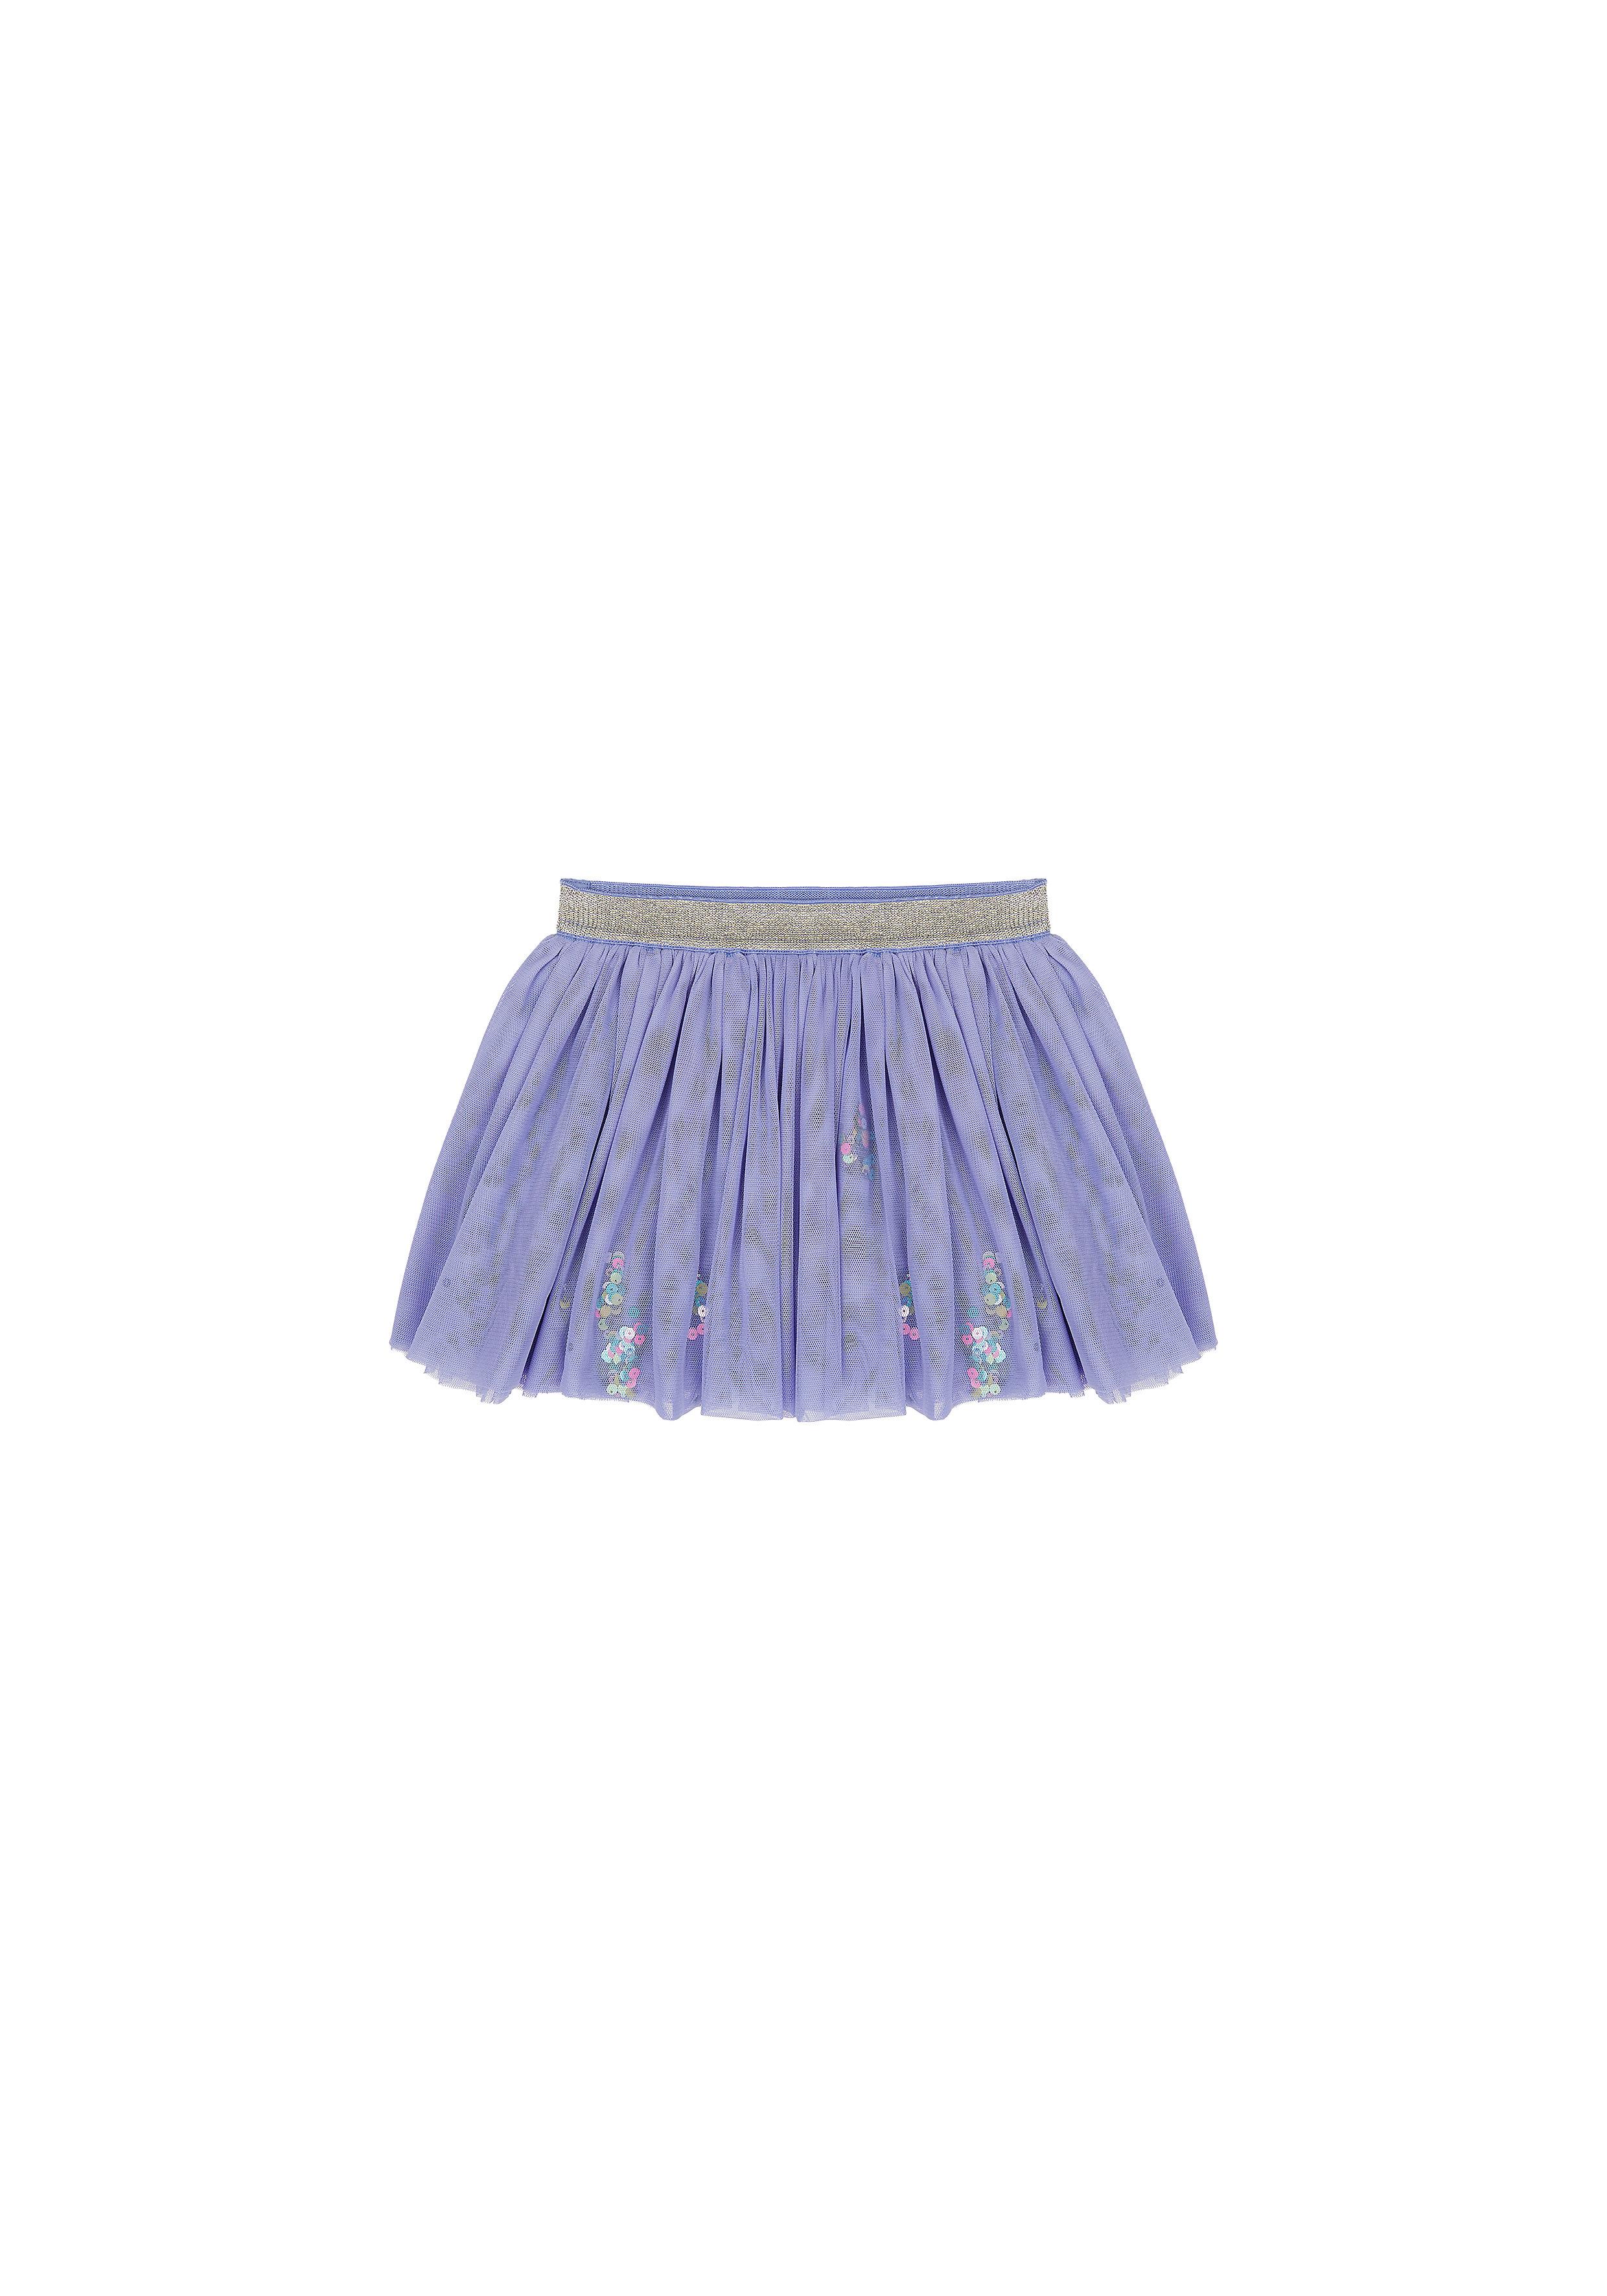 Mothercare | Girls Mesh Skirt Sequin Detail - Lilac